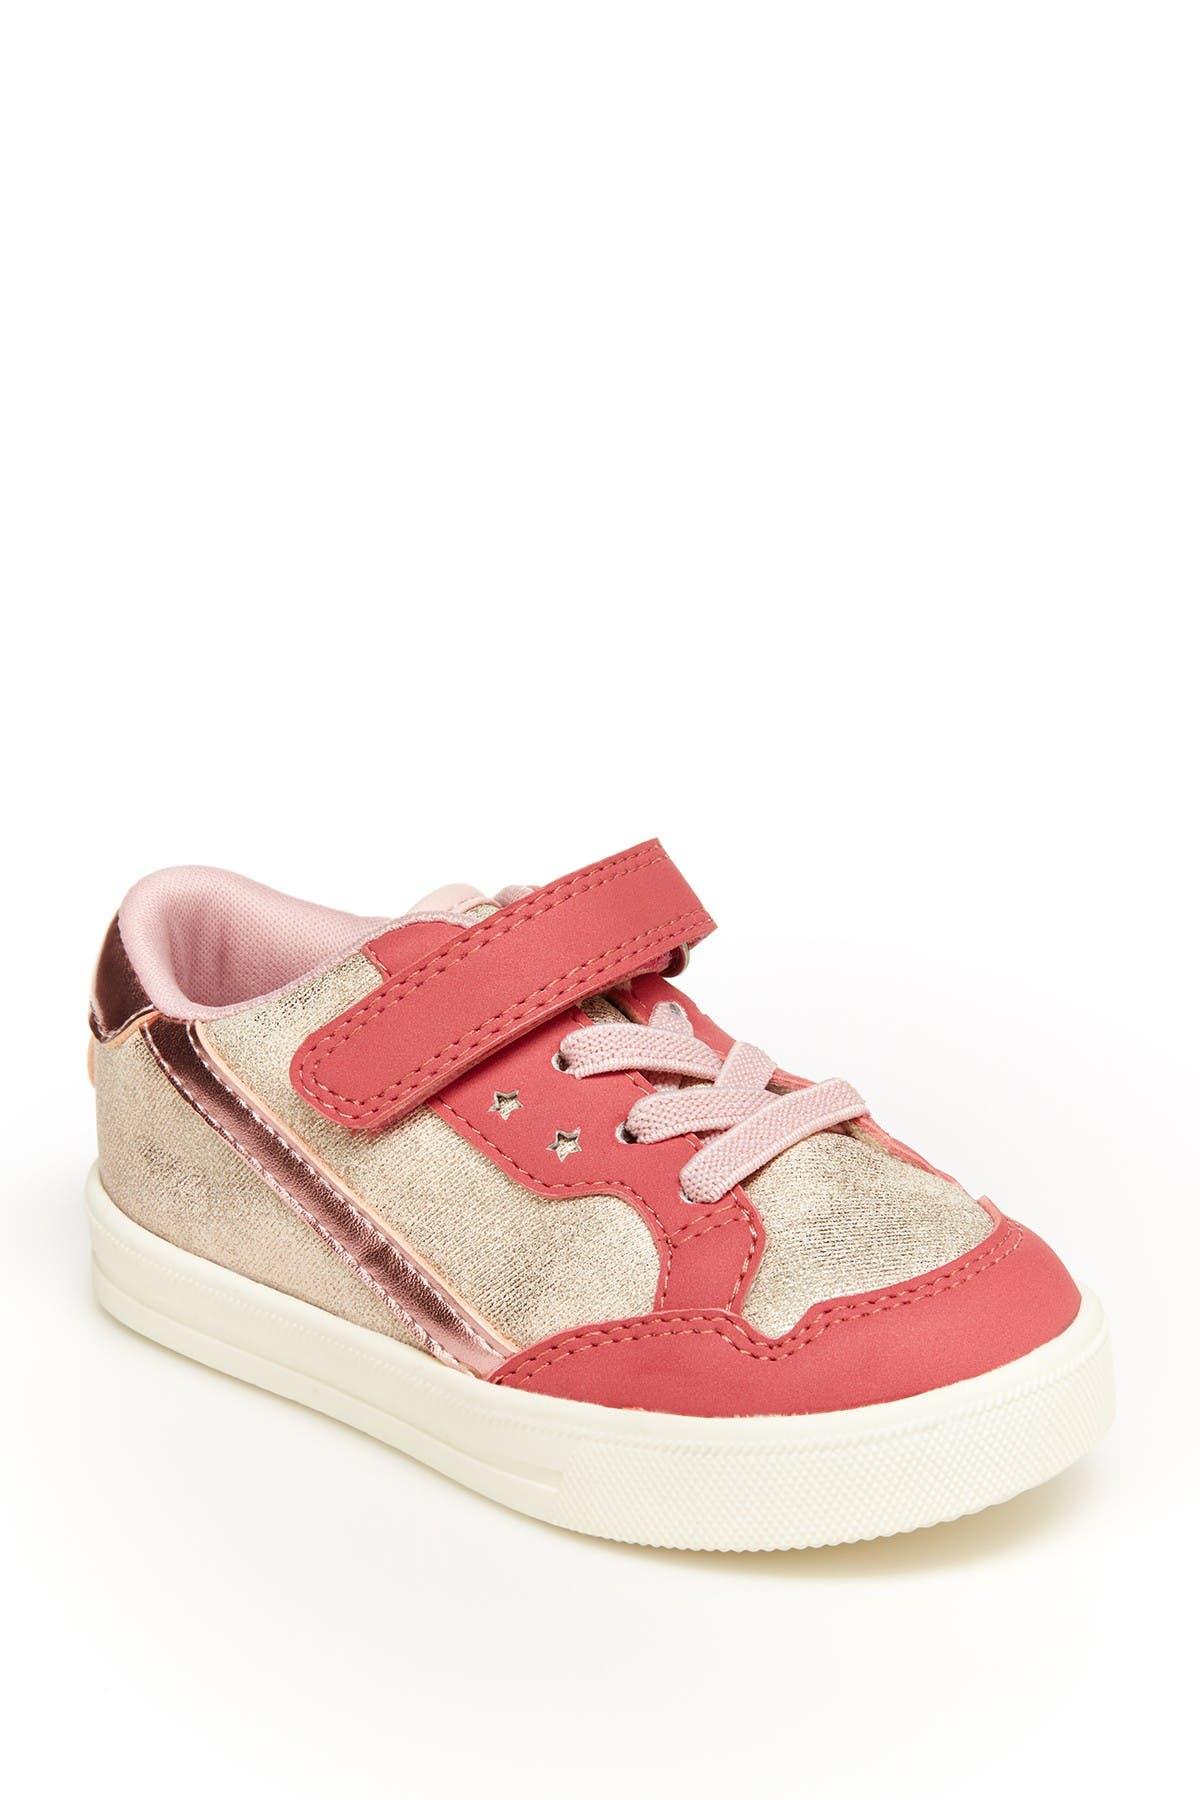 Image of OshKosh Carmen Sneaker